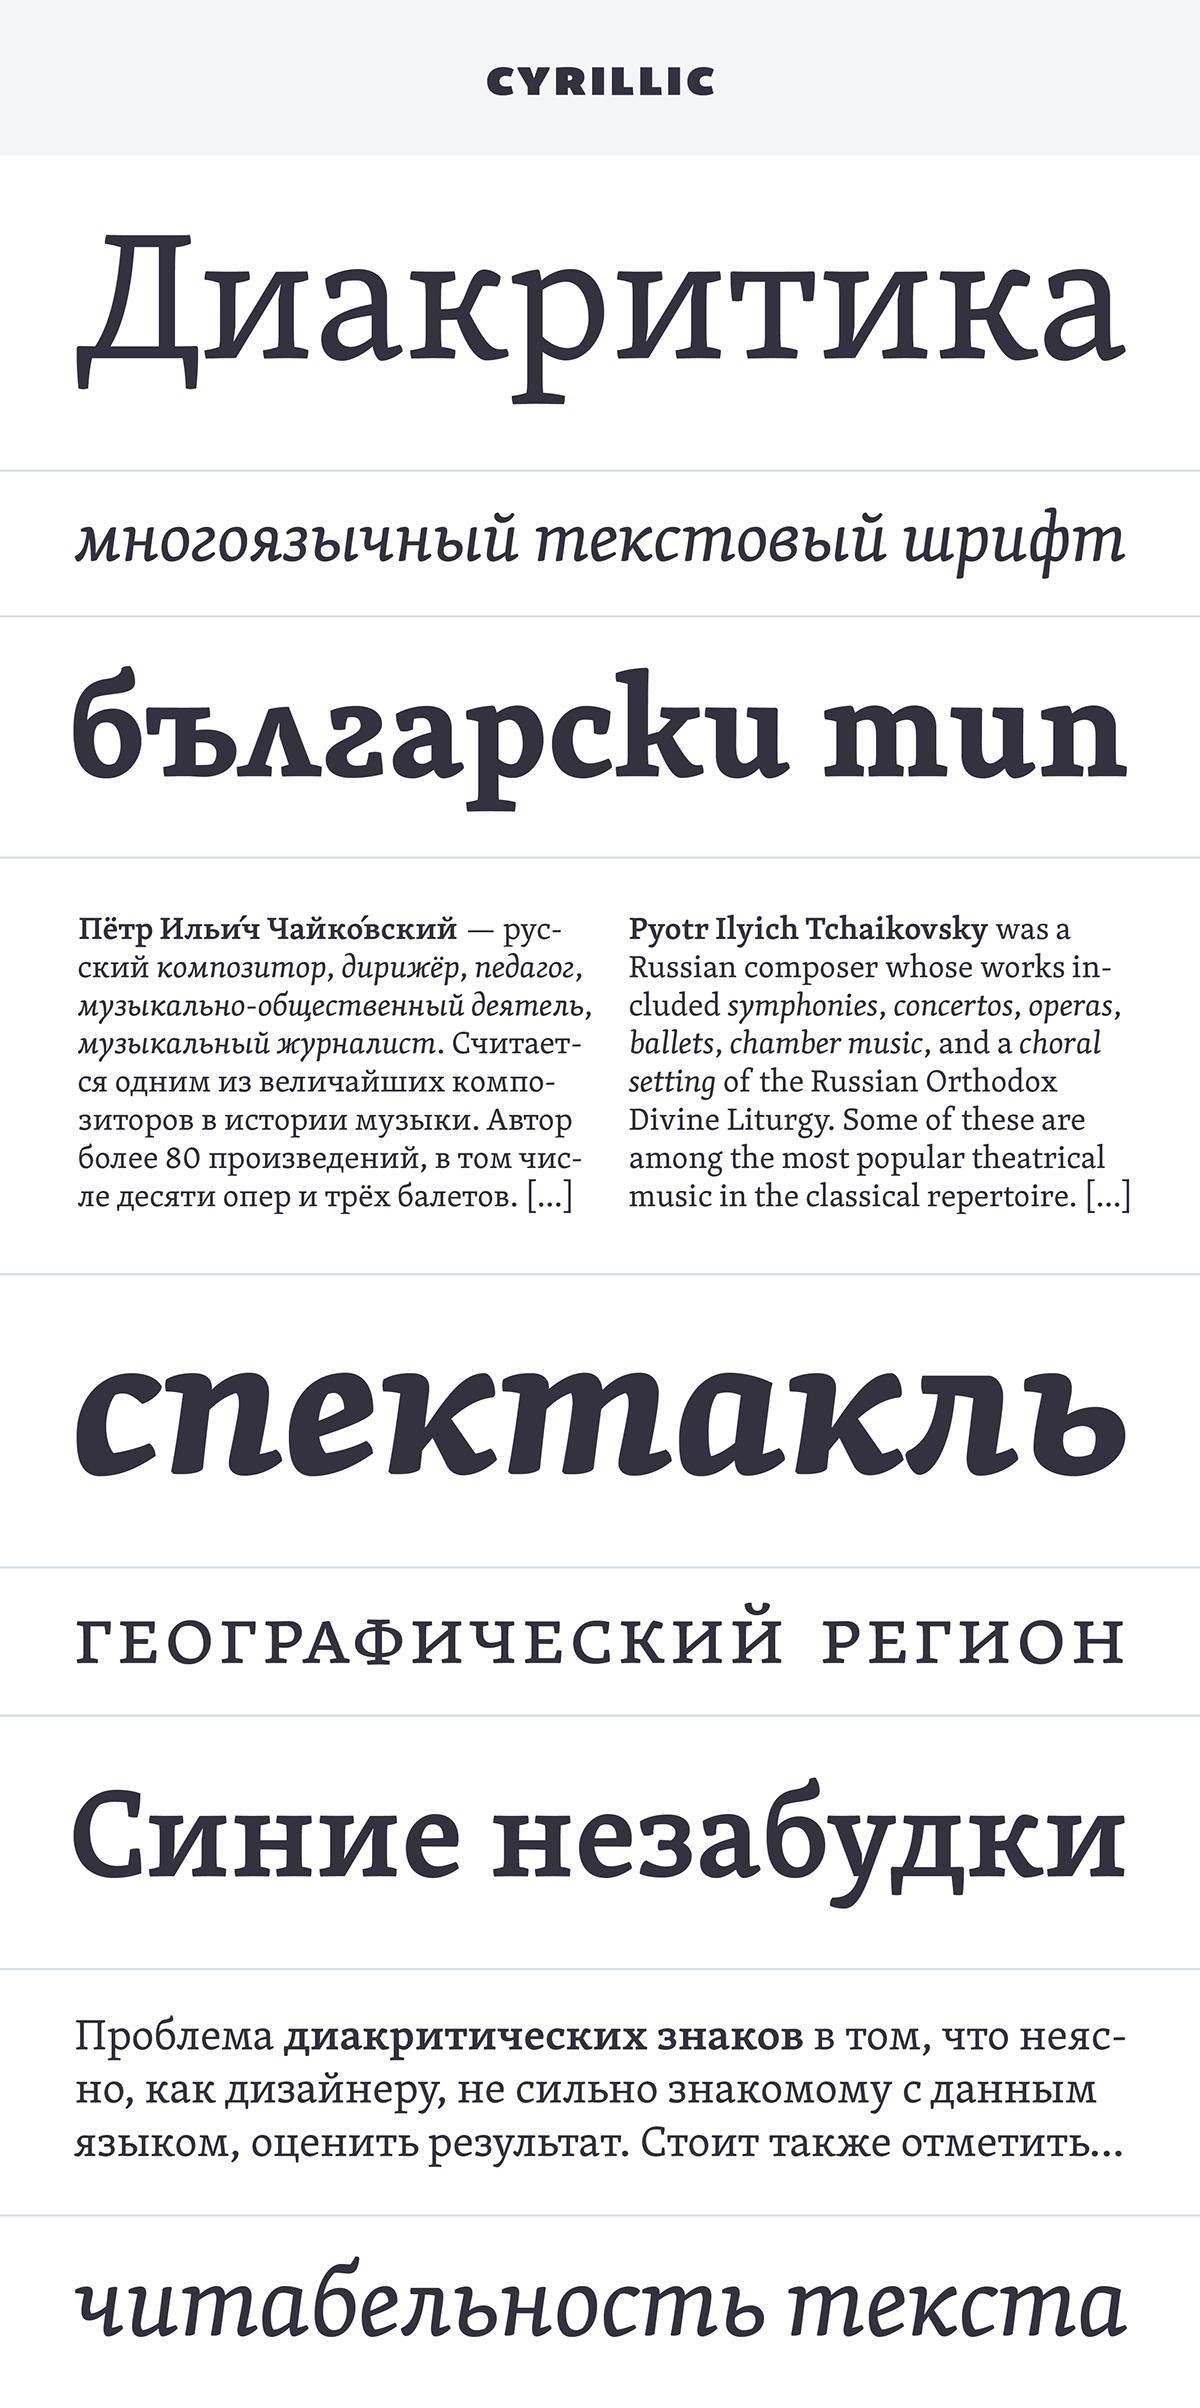 Typeface font David Březina rosetta type foundry book serif Publications editorial Czech Cyrlic greek